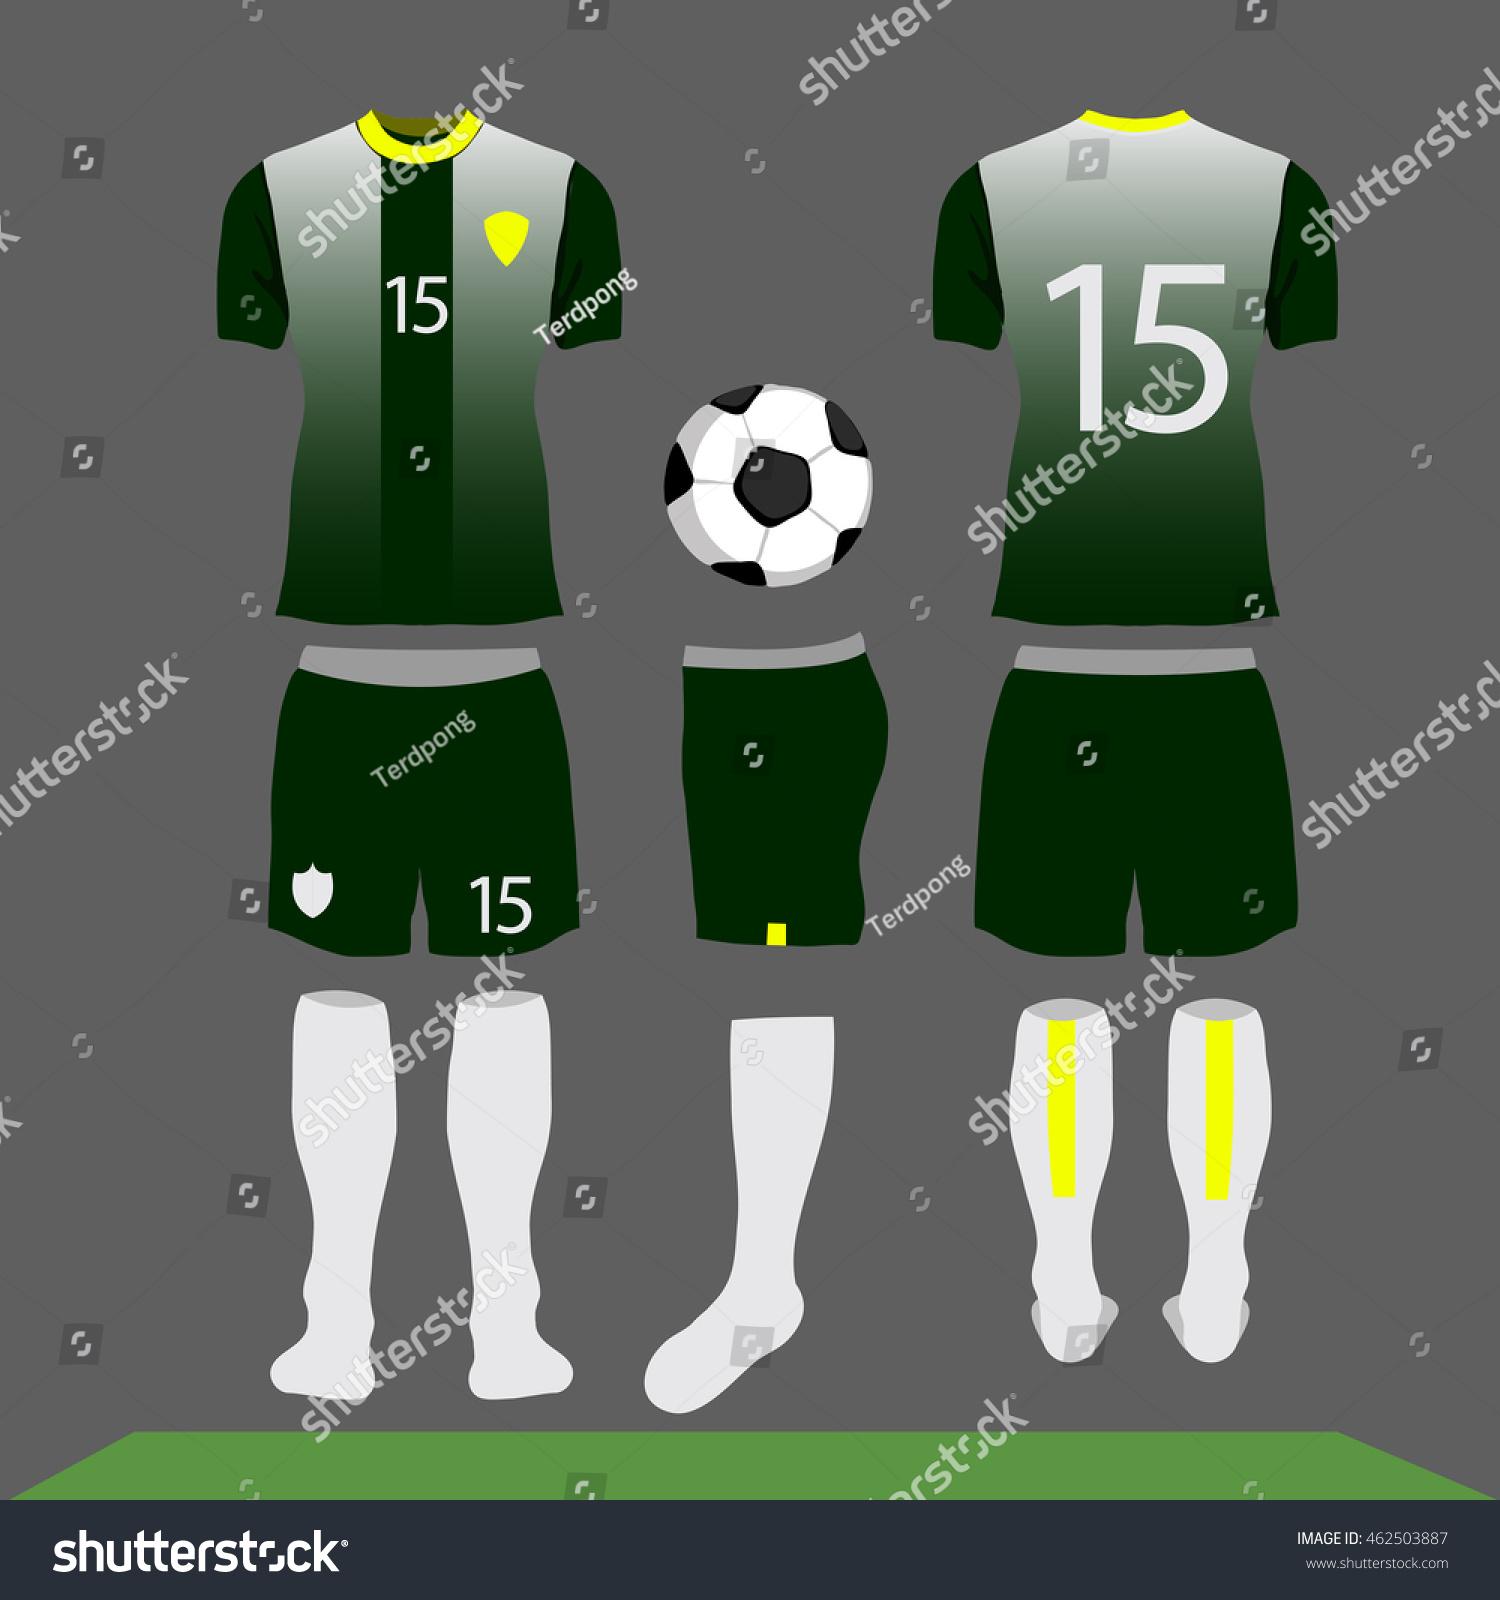 Royalty Free Football Kit Design Shirt Soccer 462503887 Stock